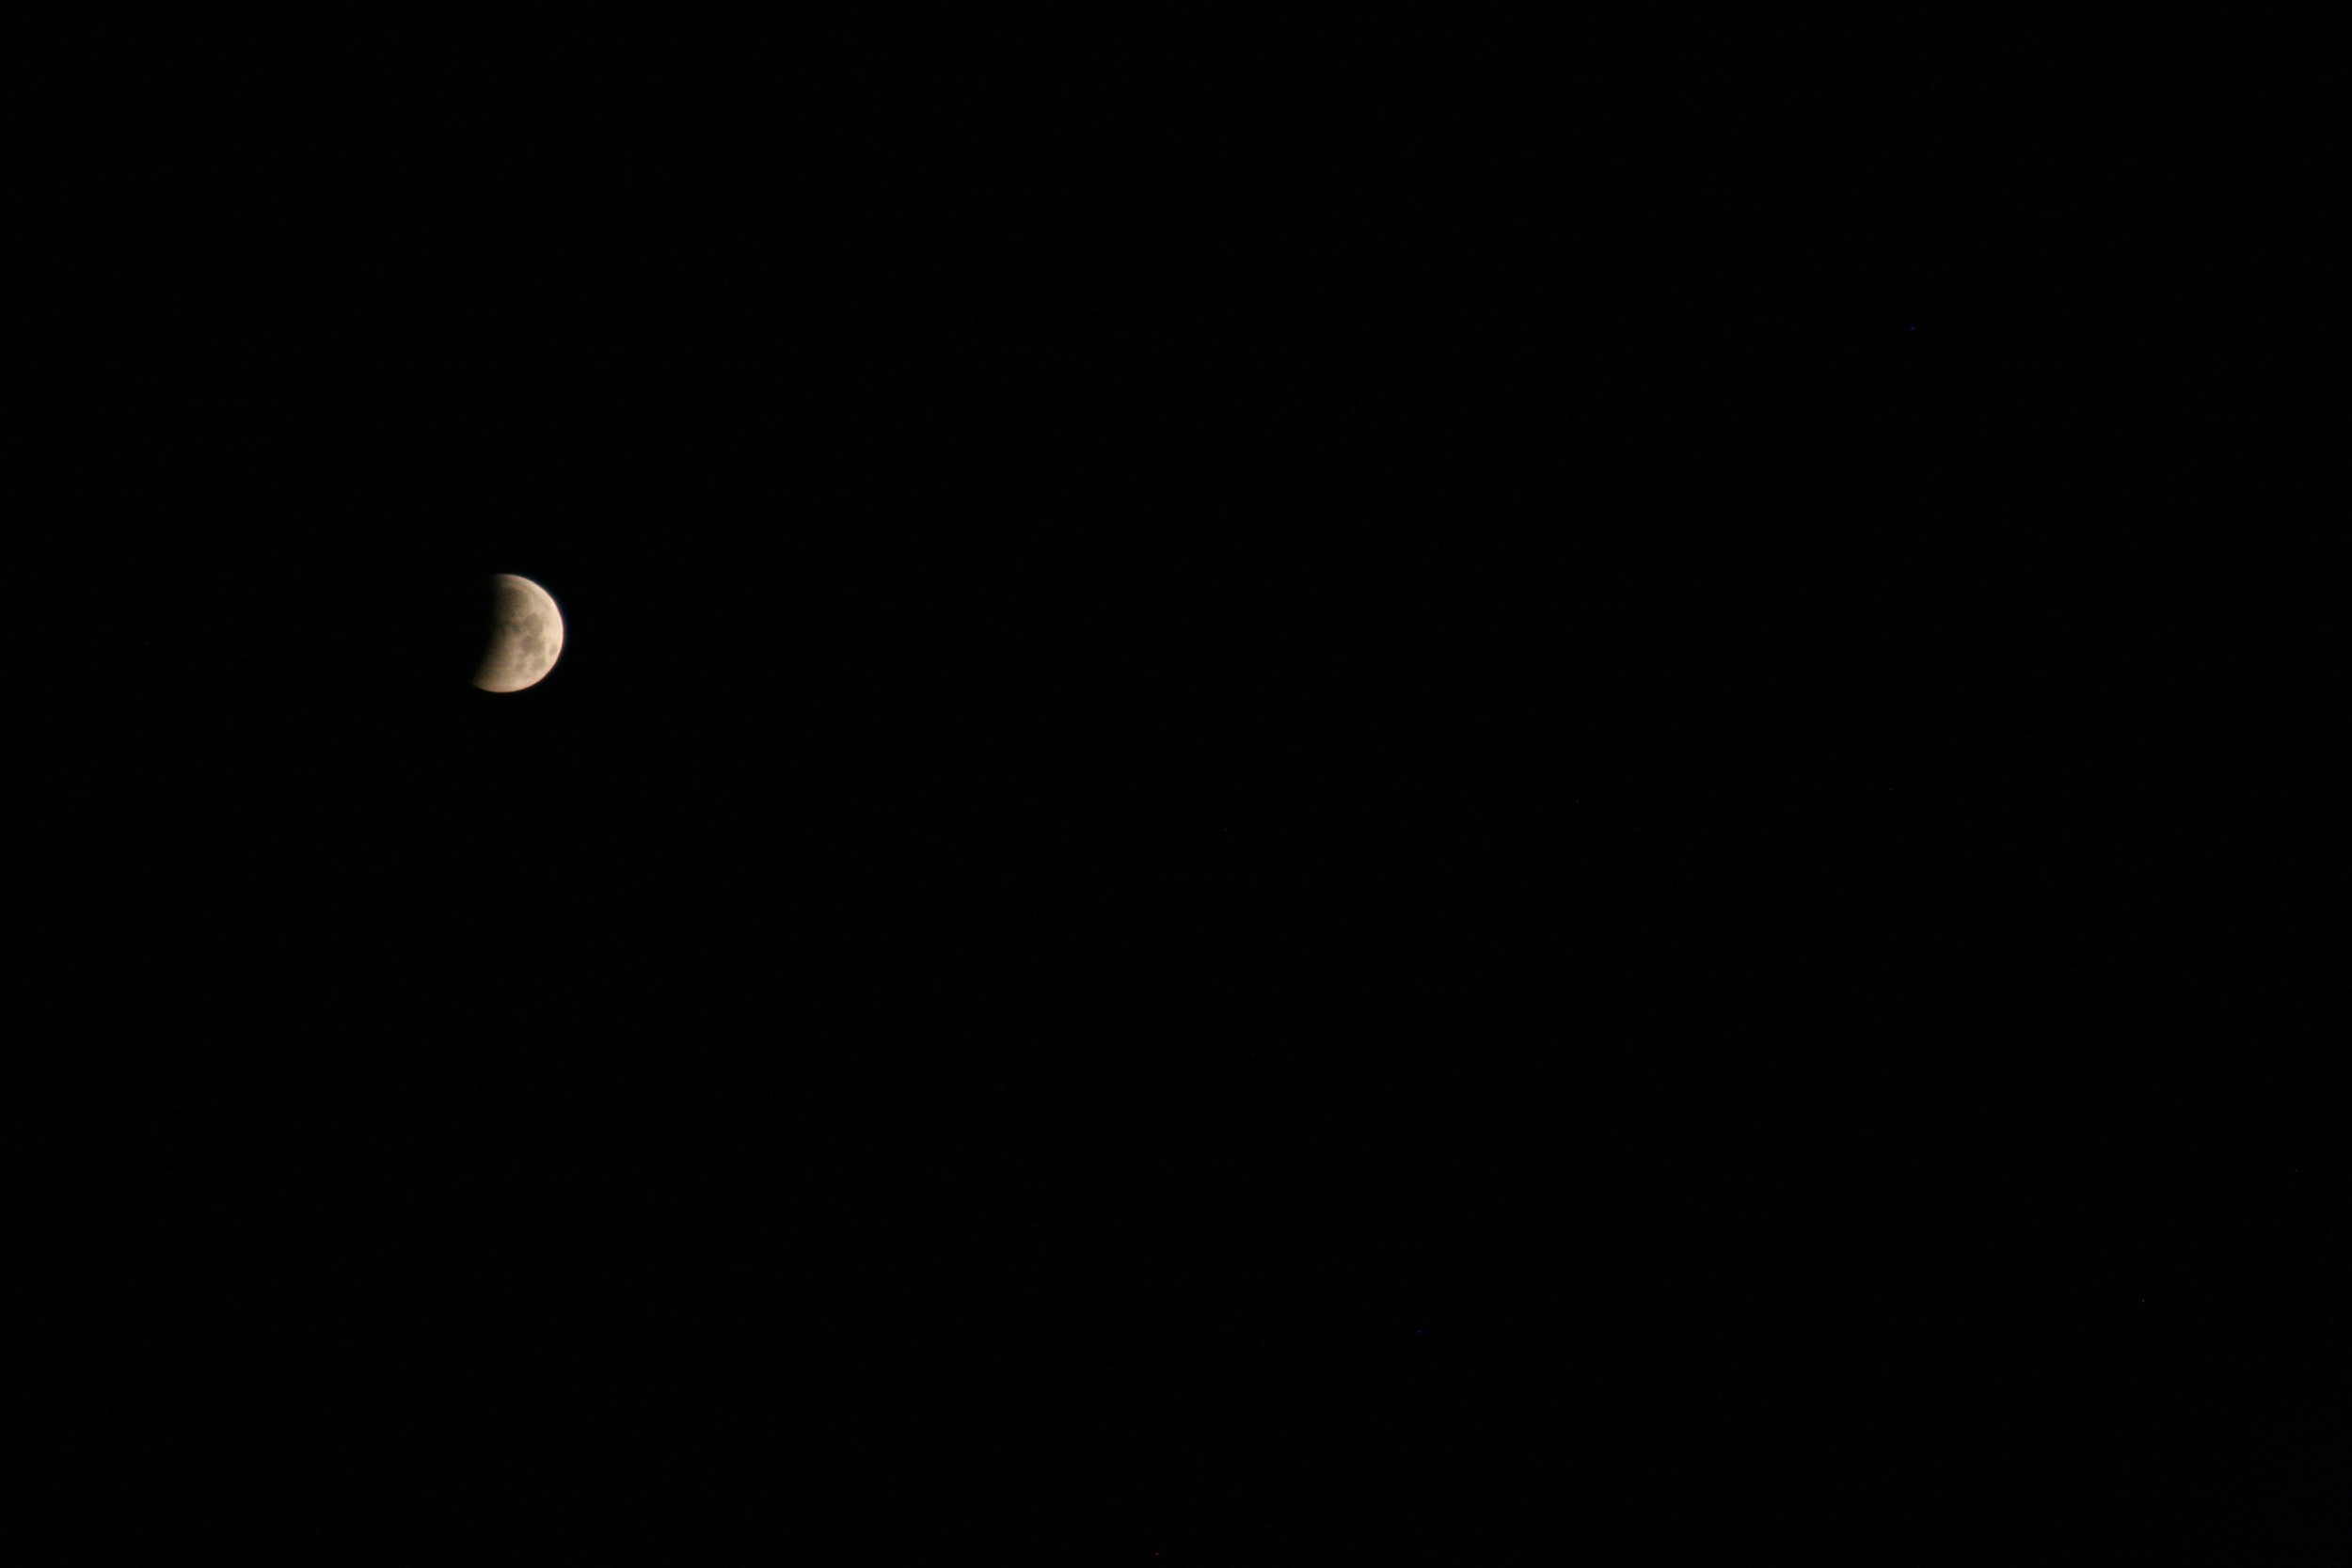 Lunar Eclipse April 20153.jpg